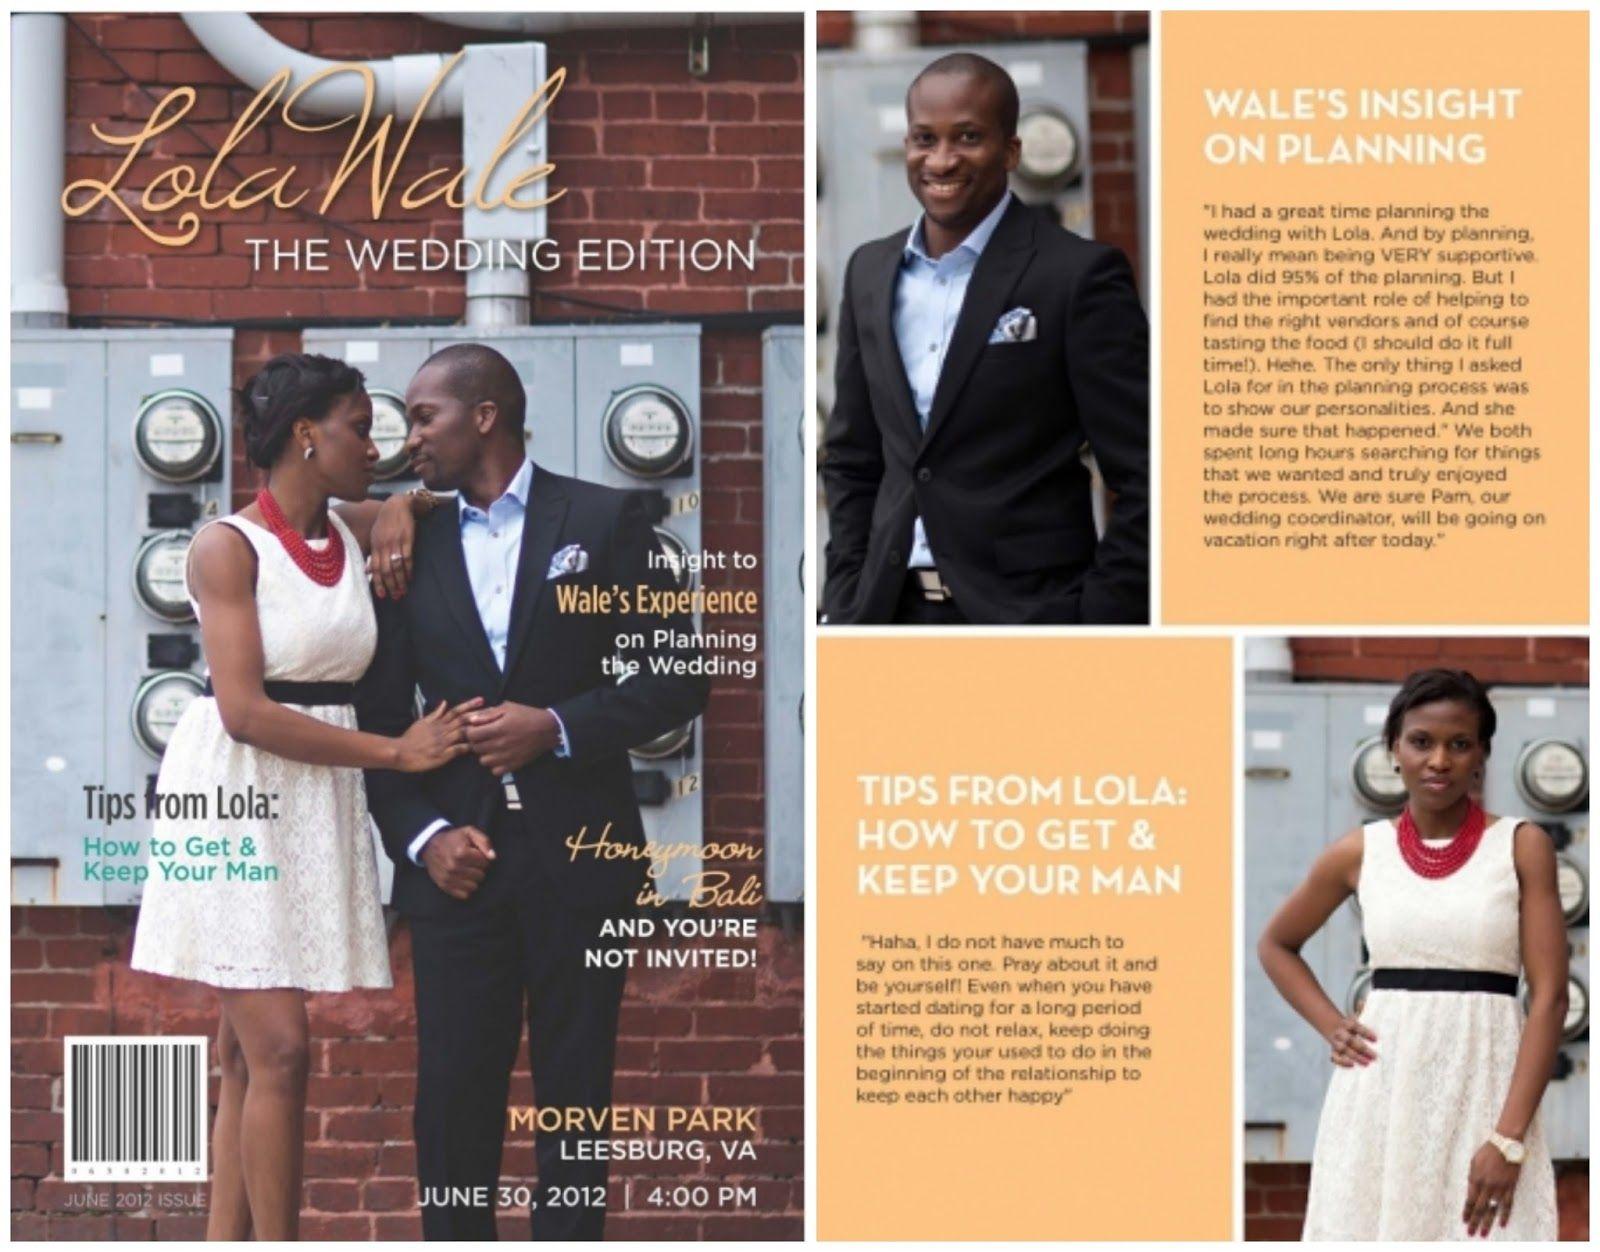 LolaWaleMagazine3.jpg (1600×1252)